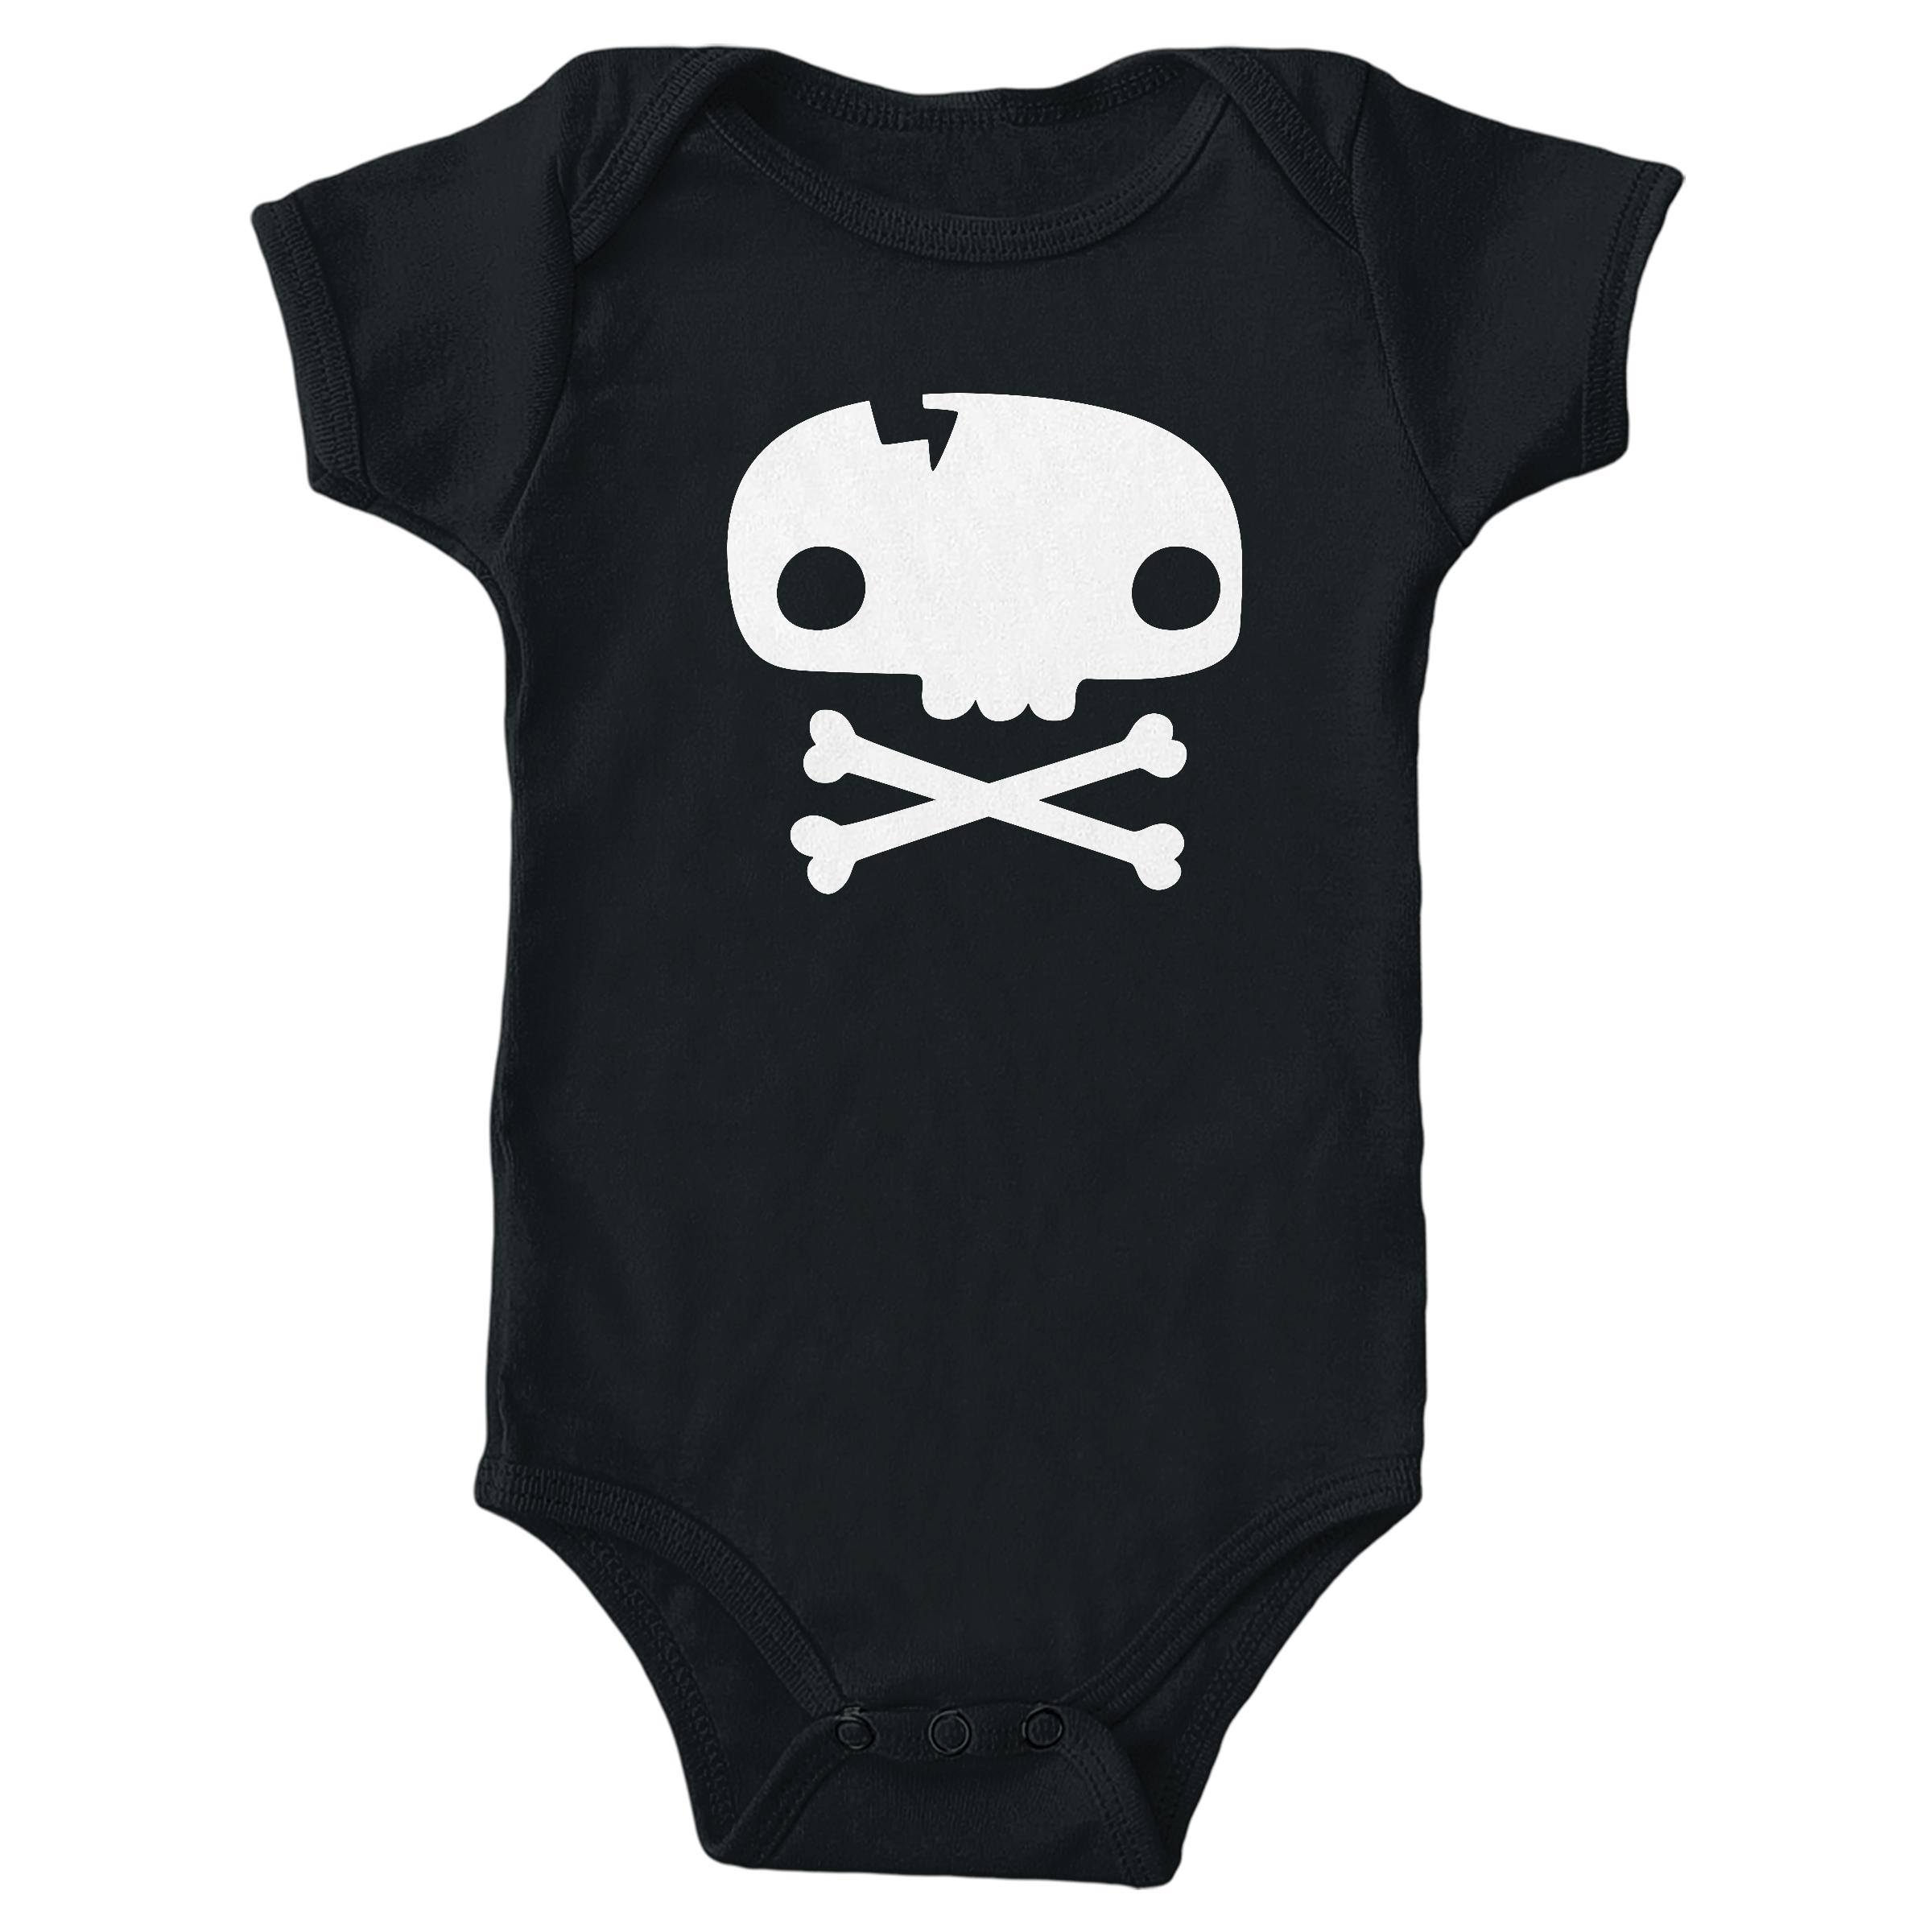 Skull Tee Black (Onesie)